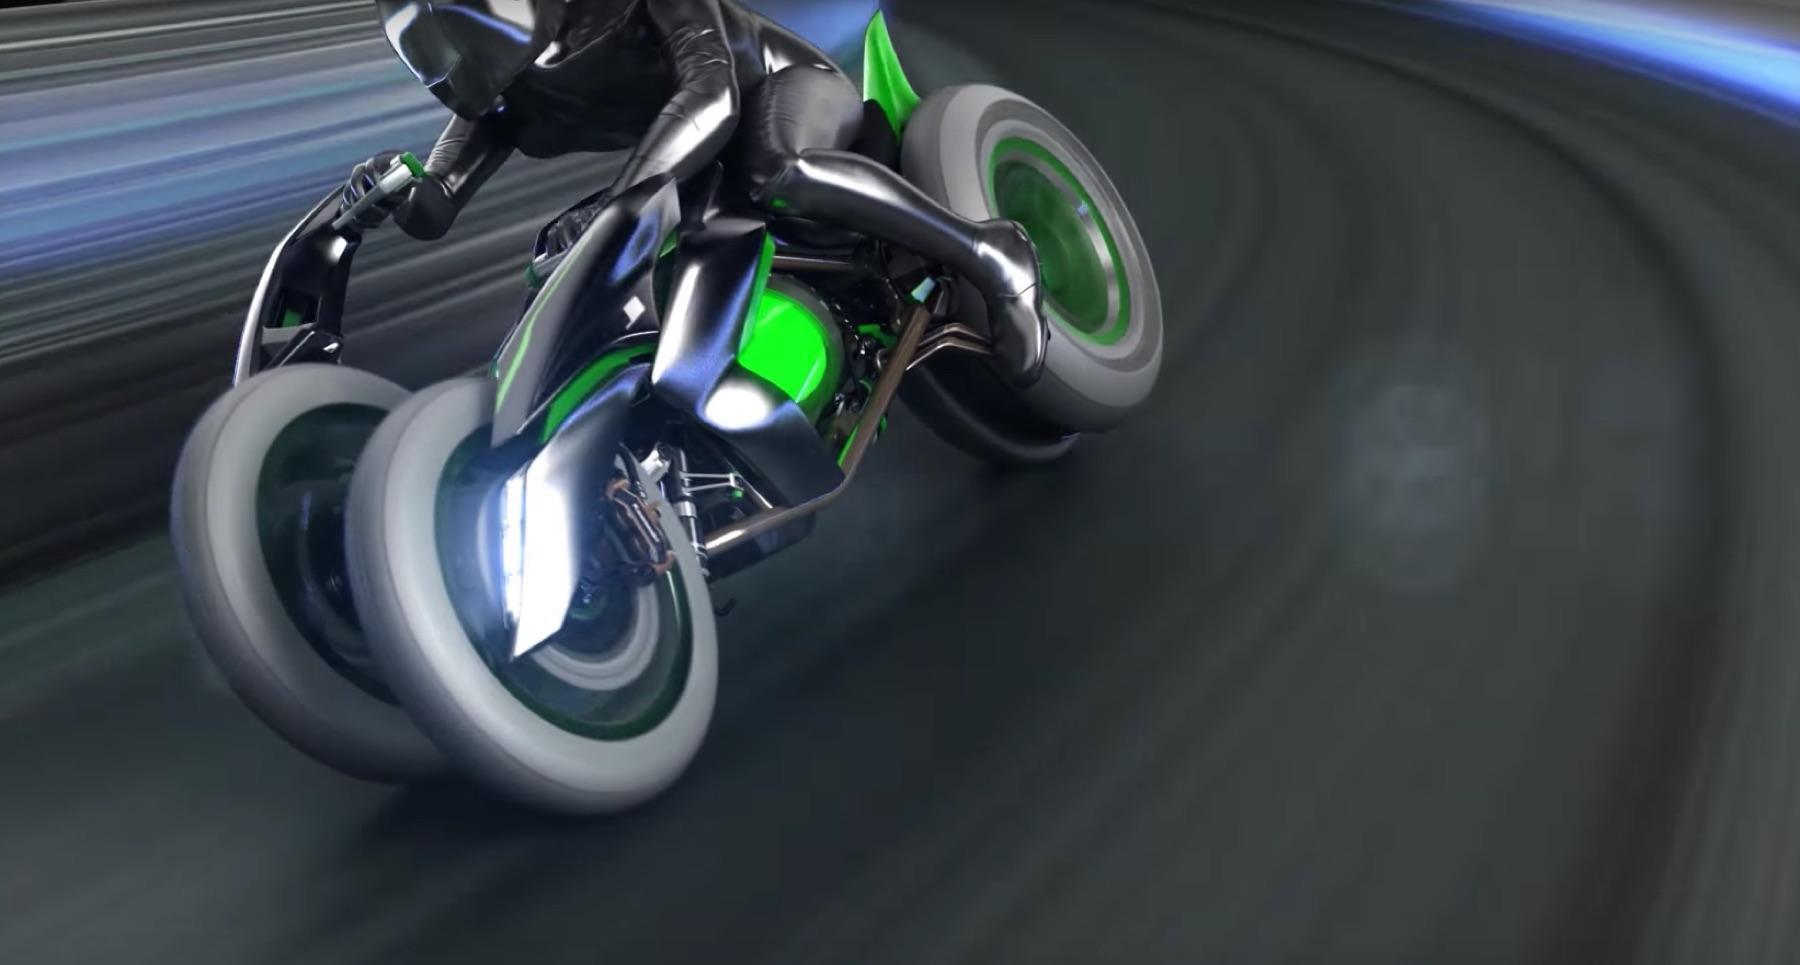 Kawasaki J Concept, tres ruedas para el futuro